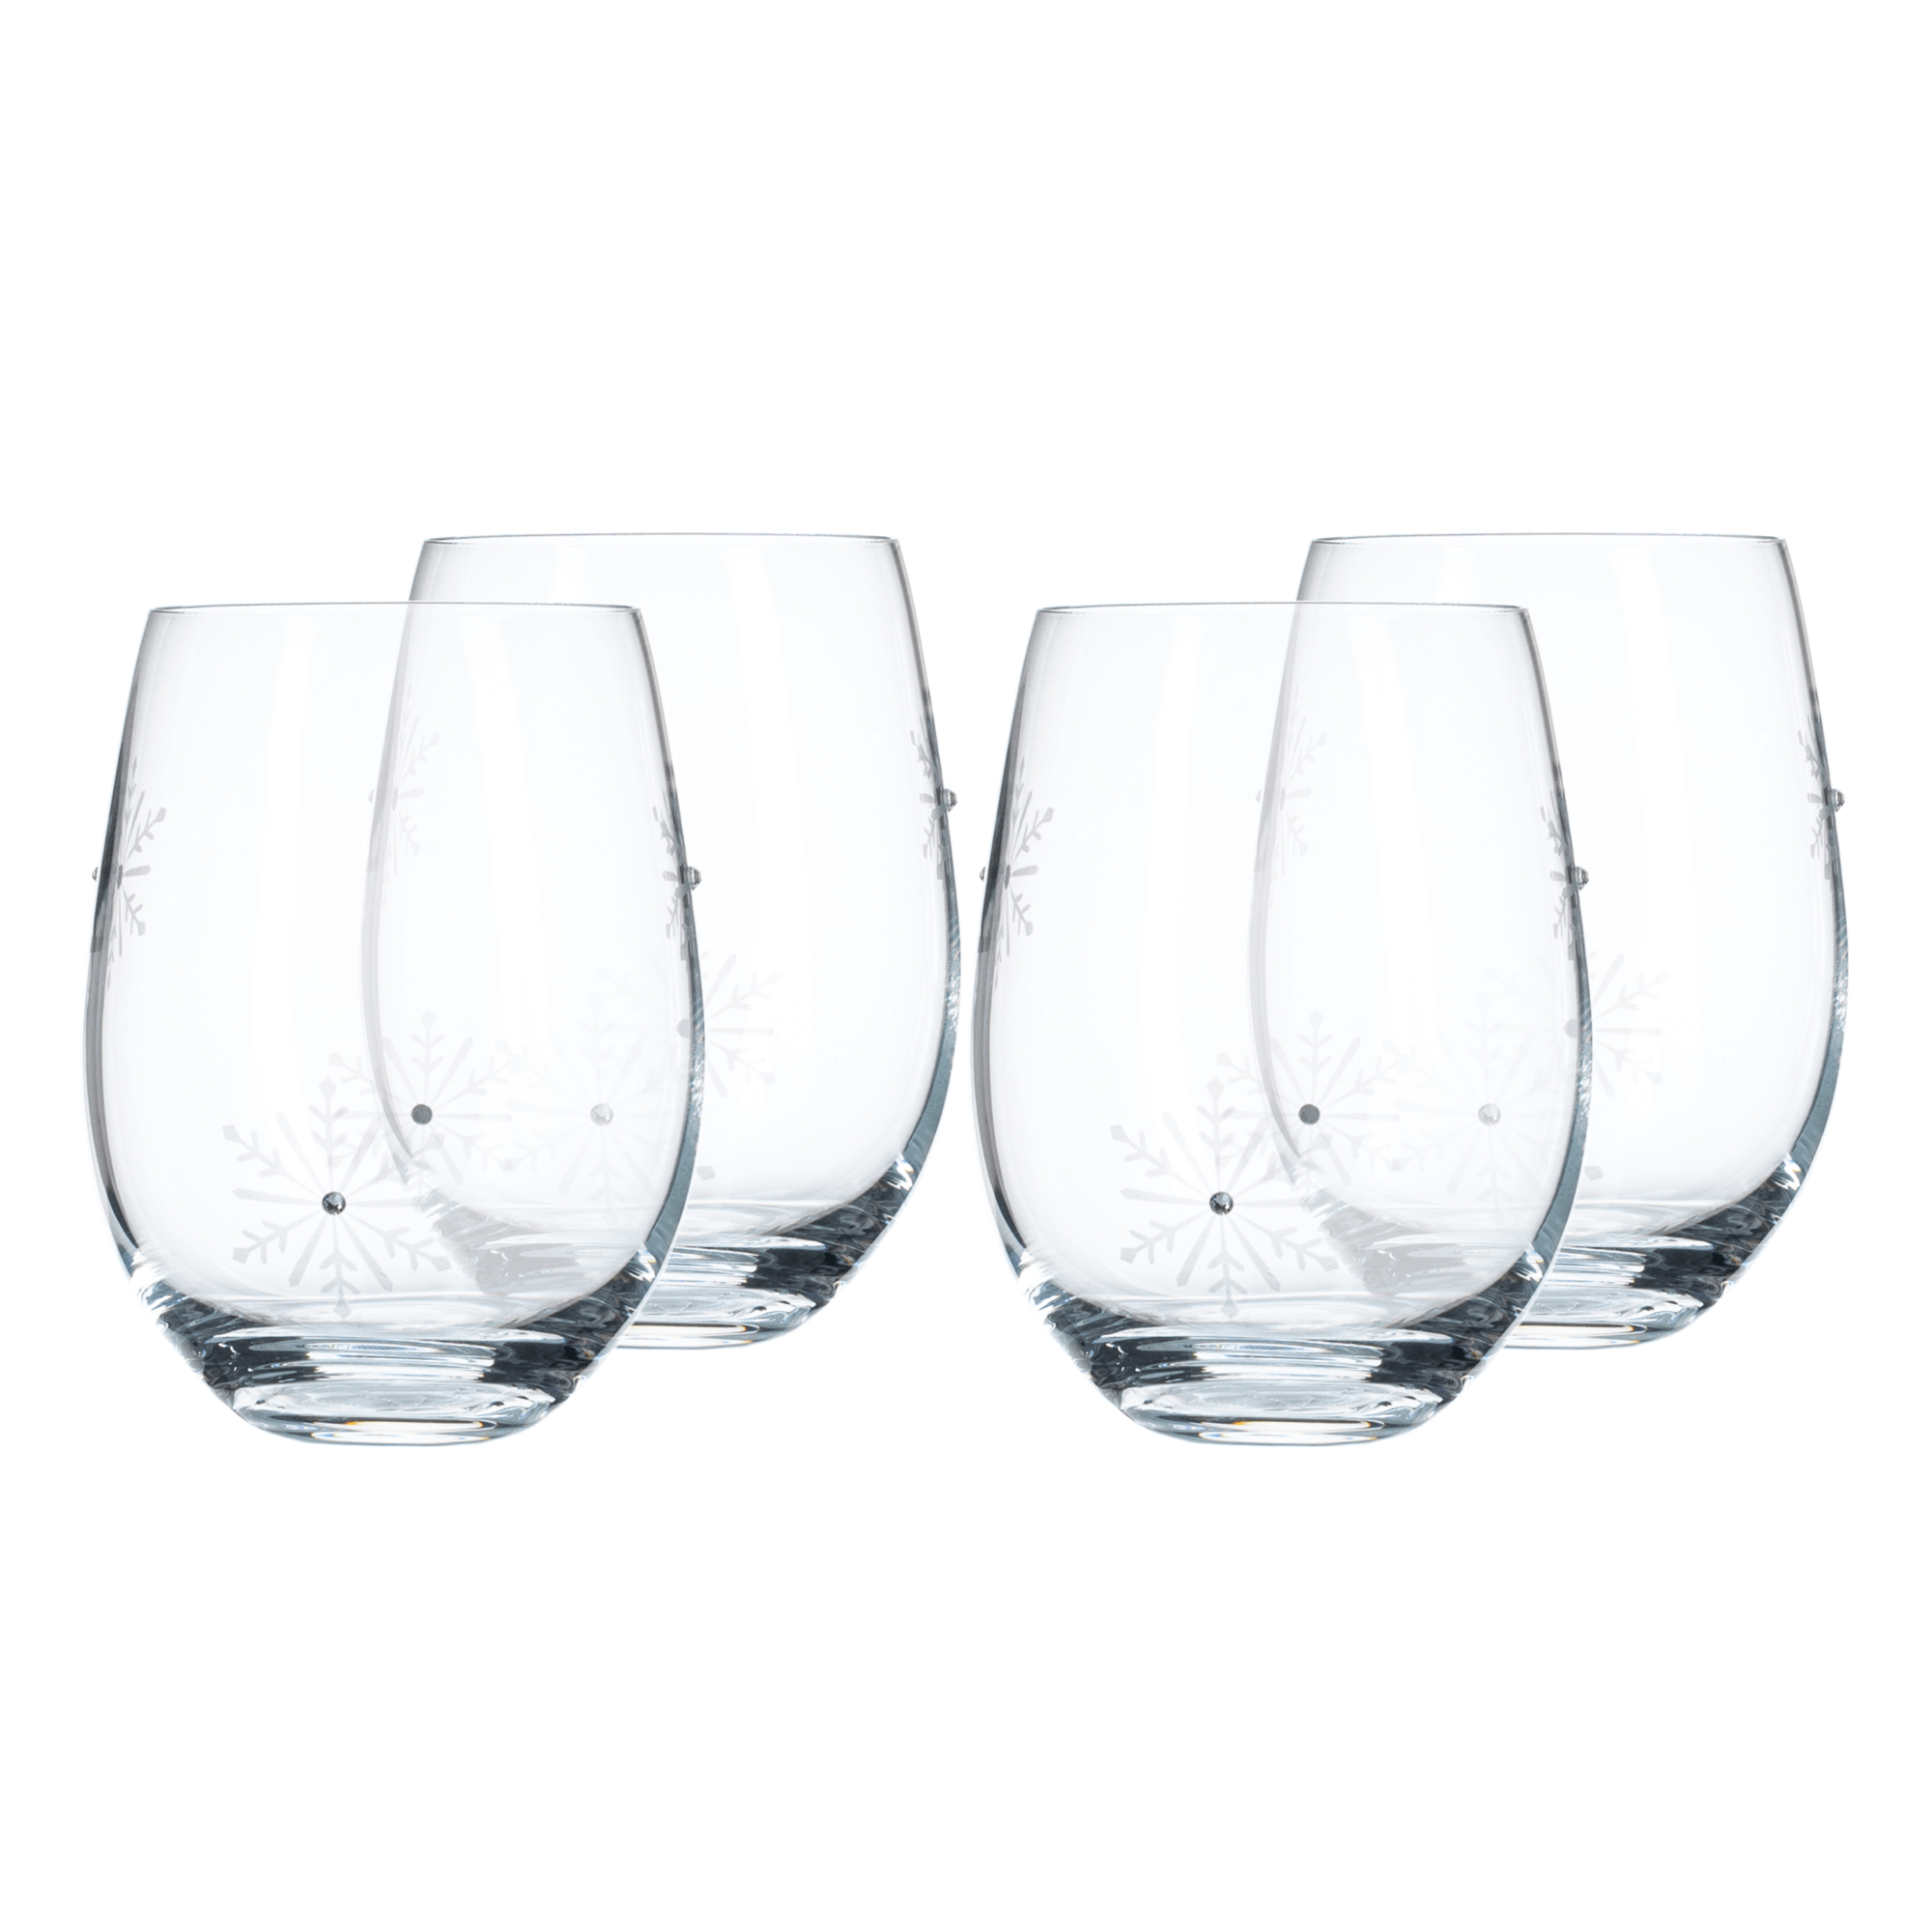 Pahare, set de 4, 530 ml, transparent / alb, SNOWFLAKE STRIK